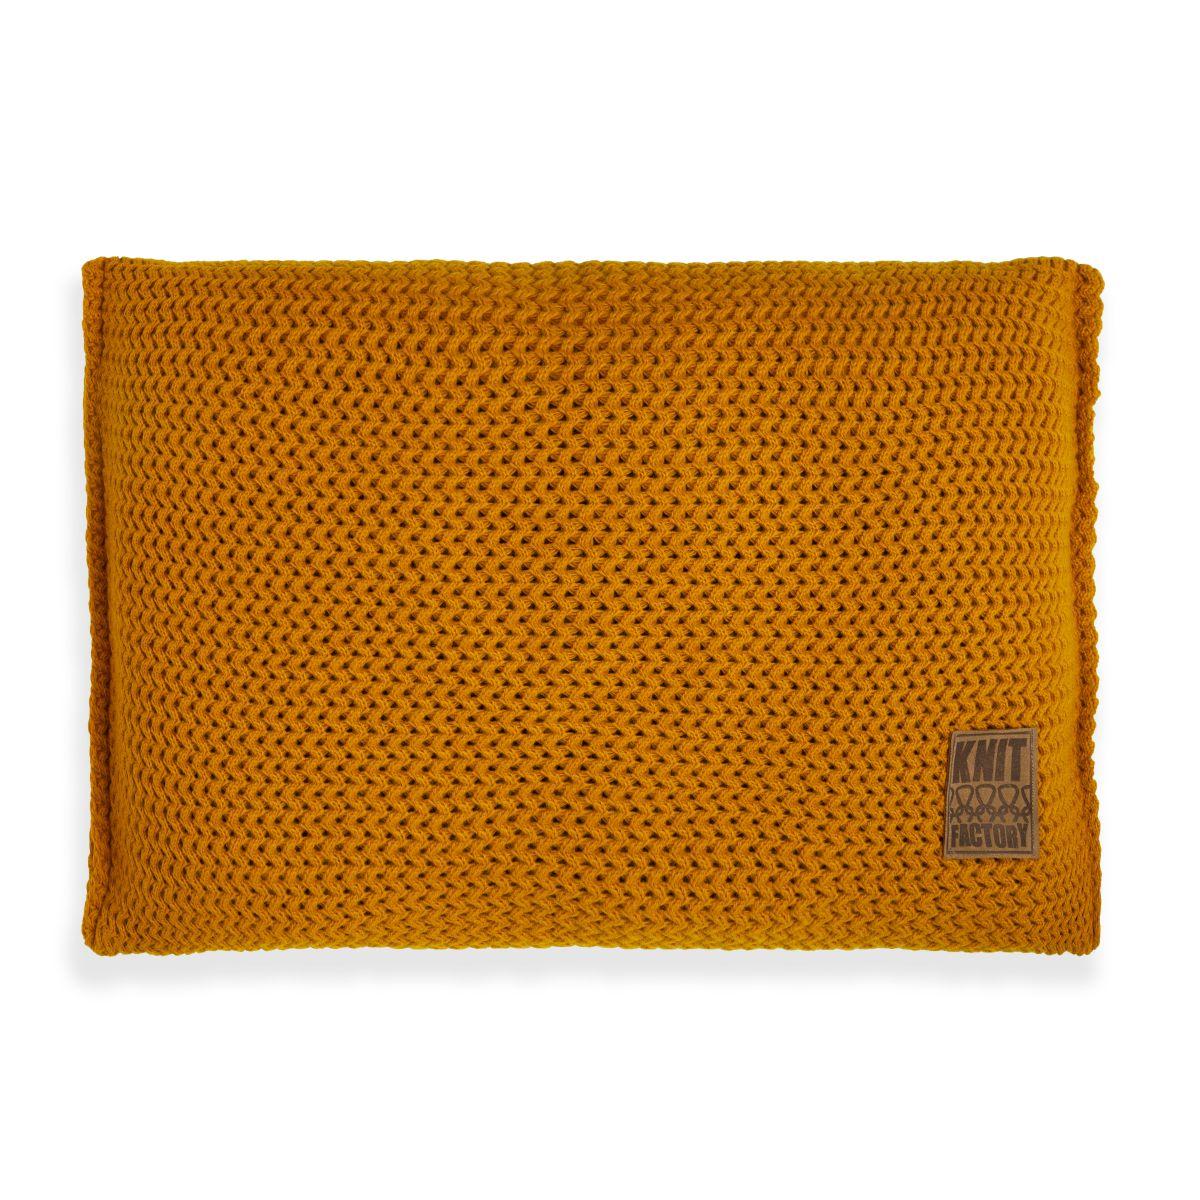 maxx cushion ochre 60x40